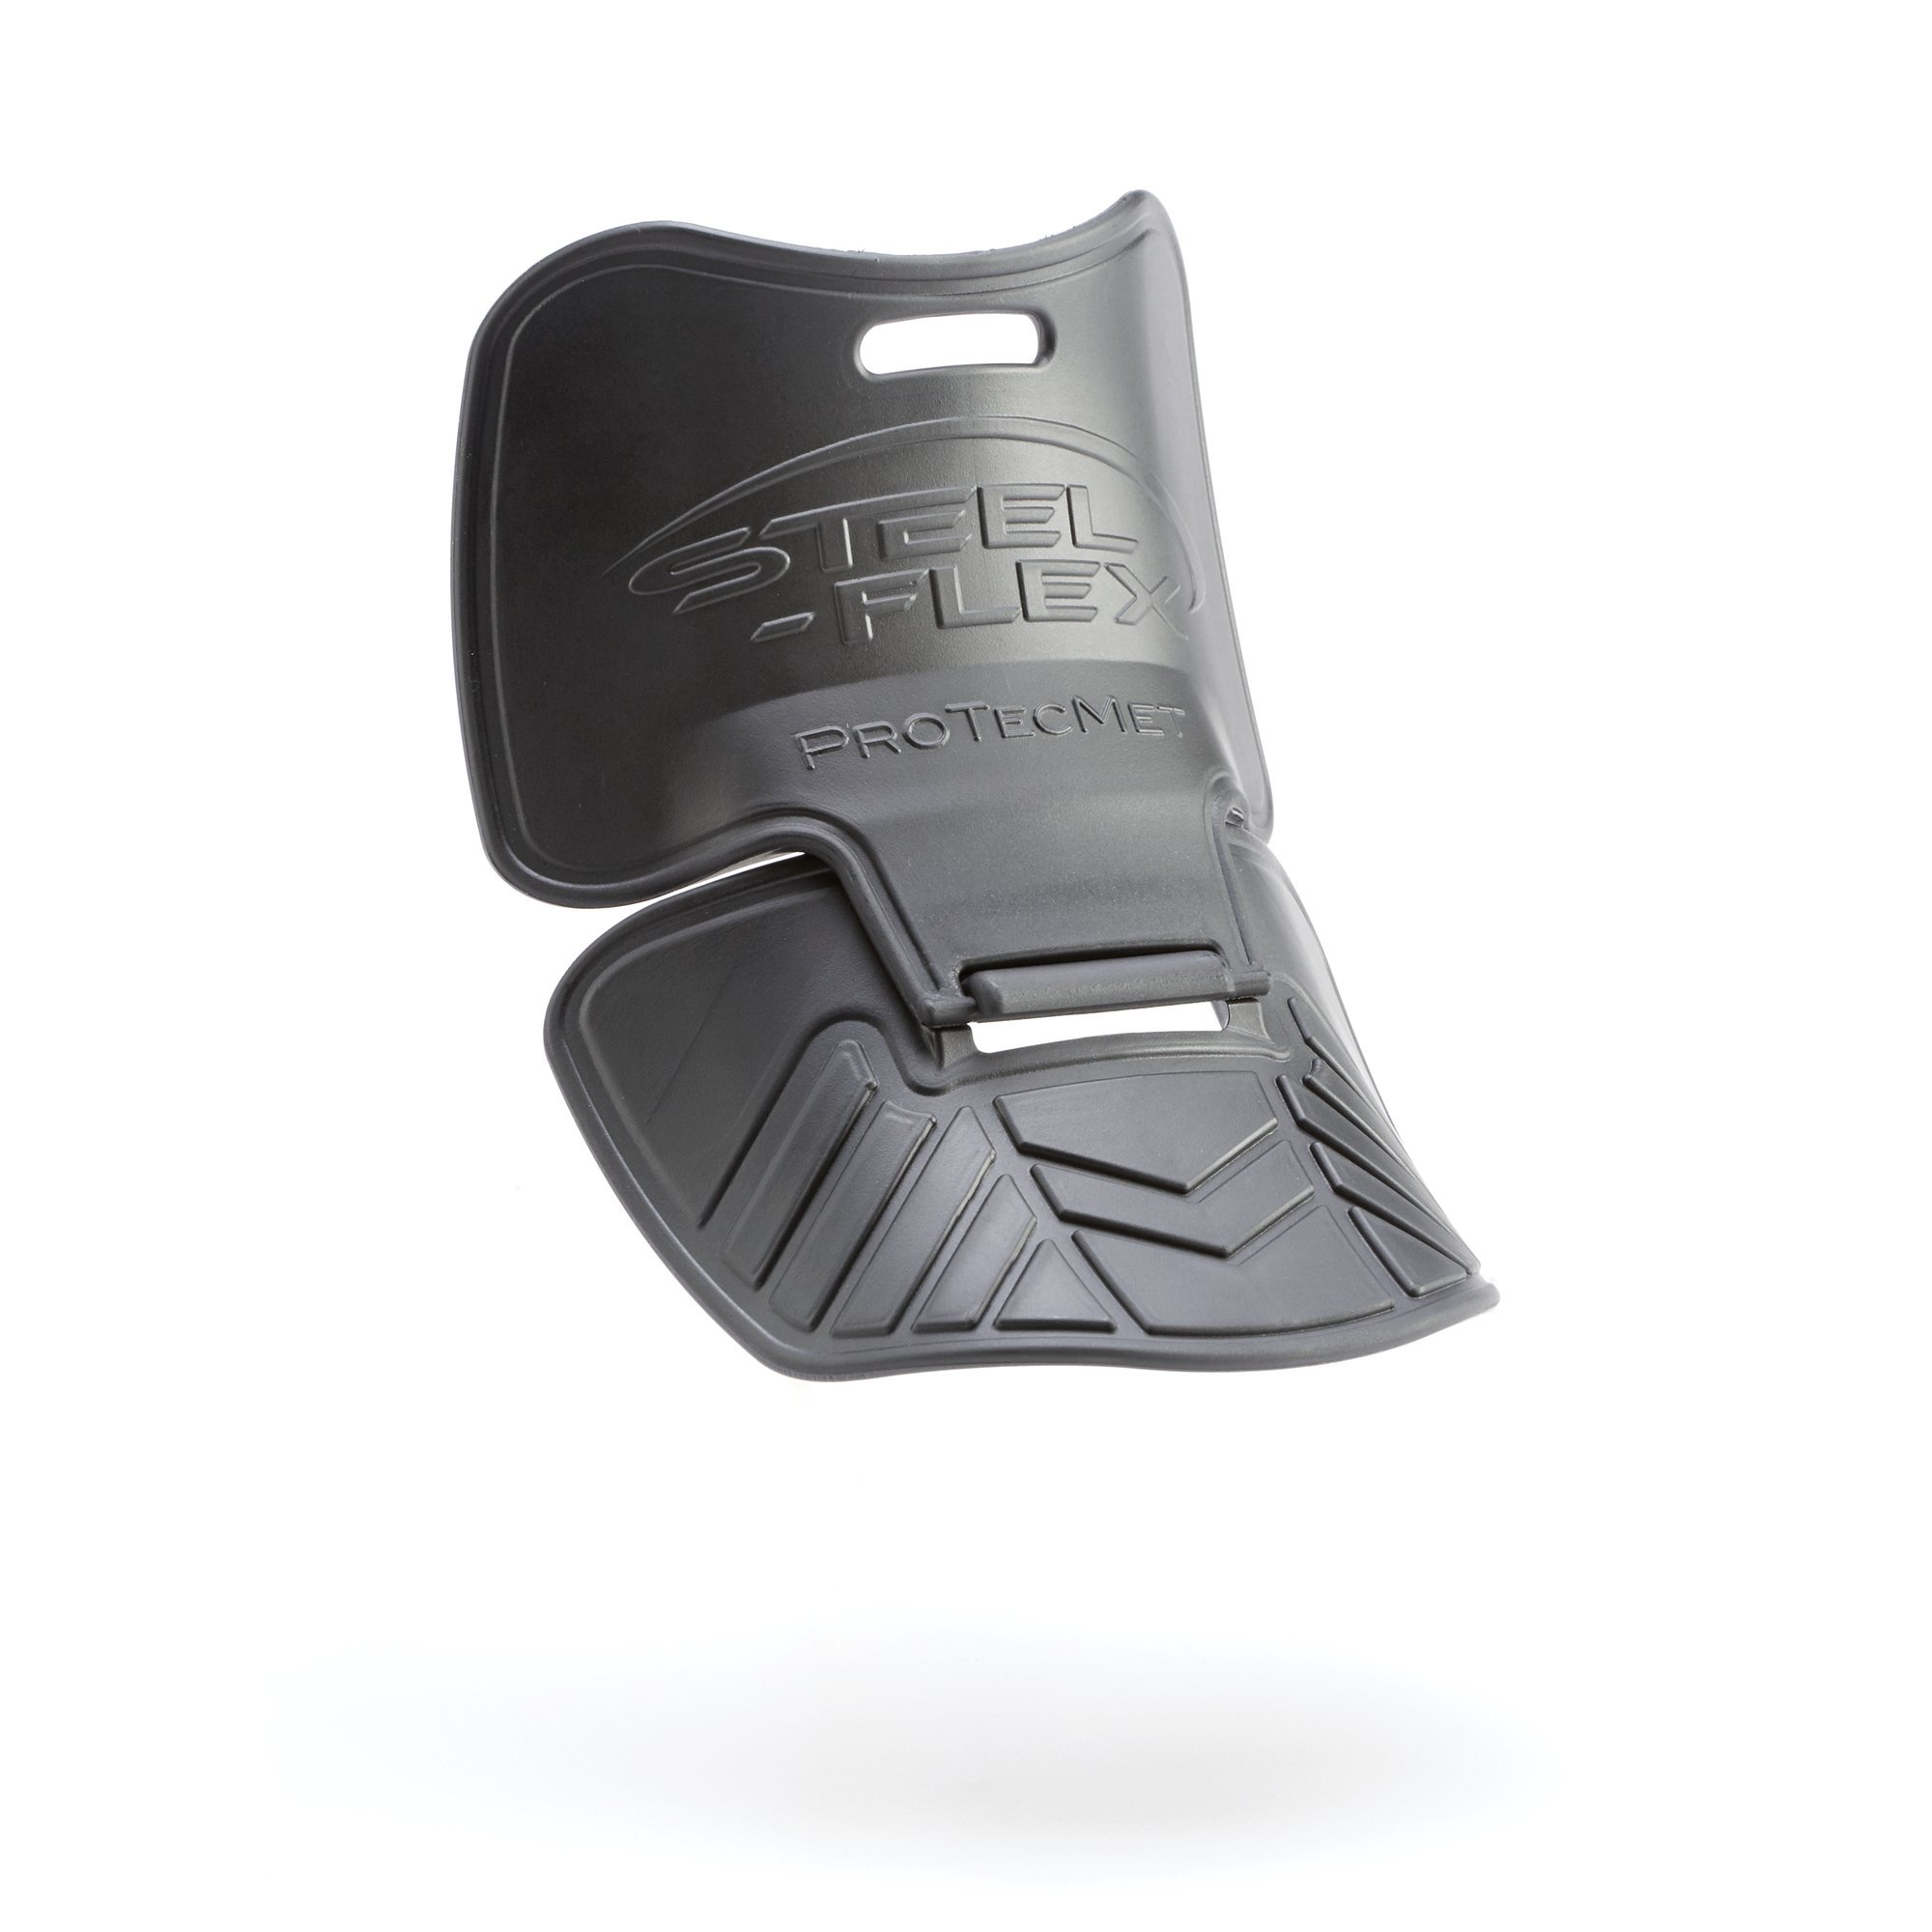 STLFLX MetGUARDZ - Metatarsal & Lace Protector (ProTecMet) by Steel-Flex